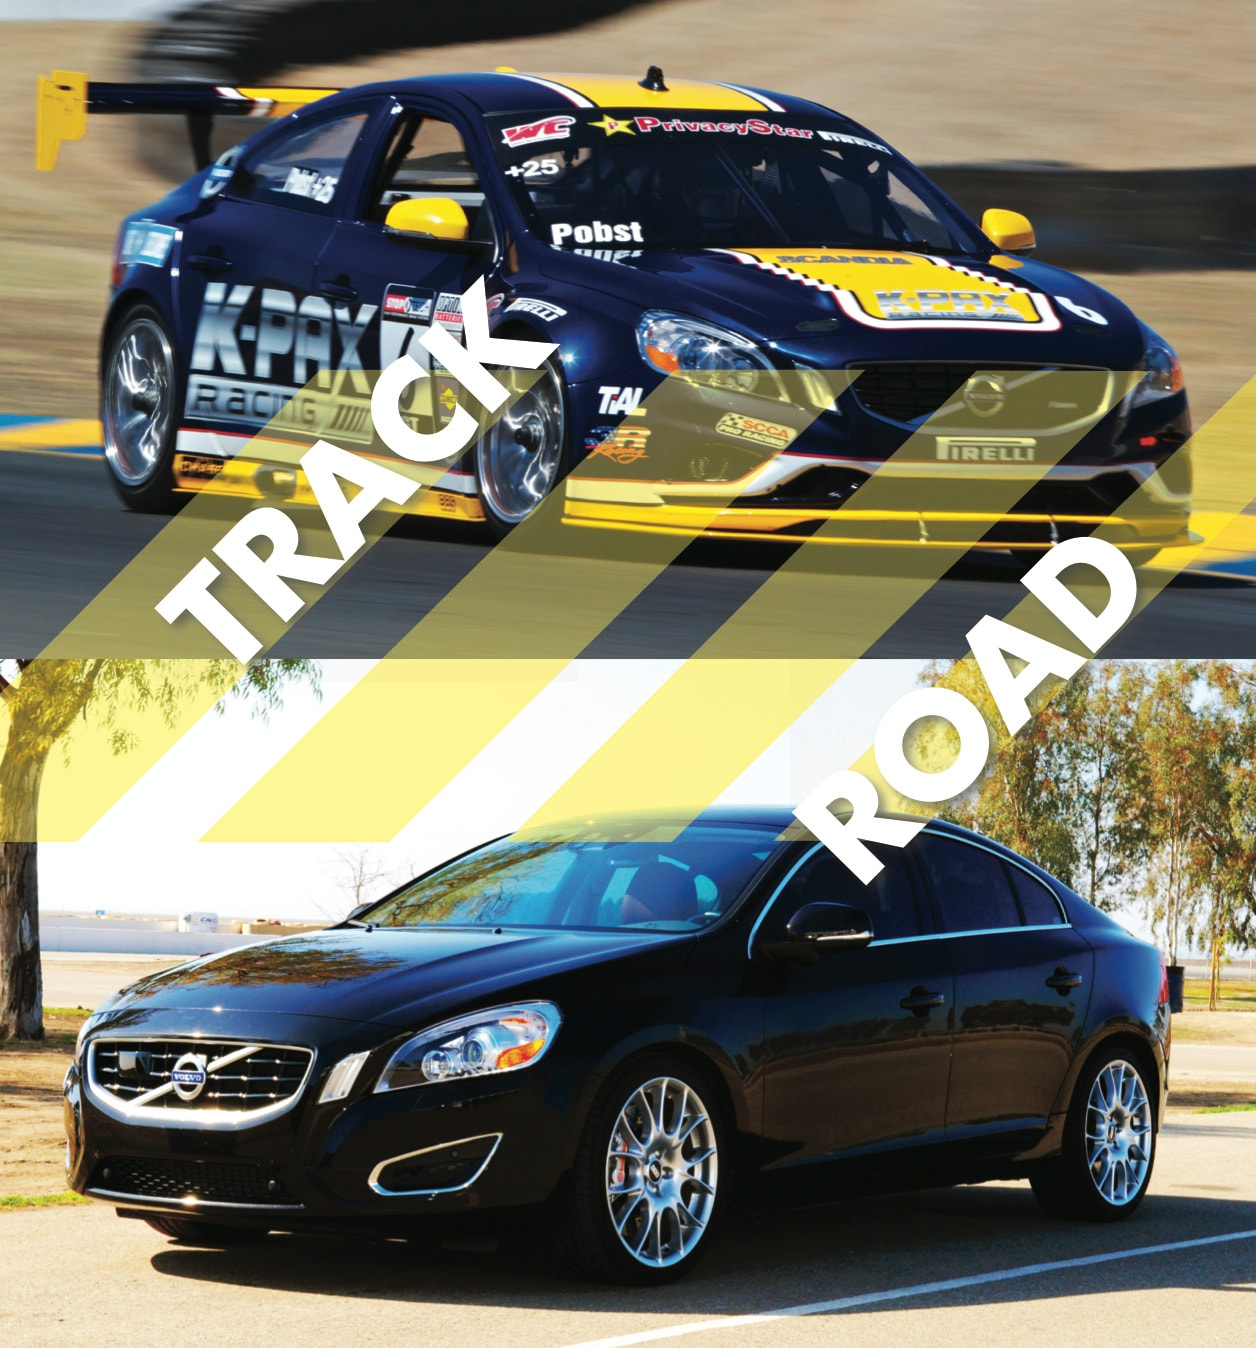 Used Volvo Orange County: Performance Through Racing: K-PAX Performance